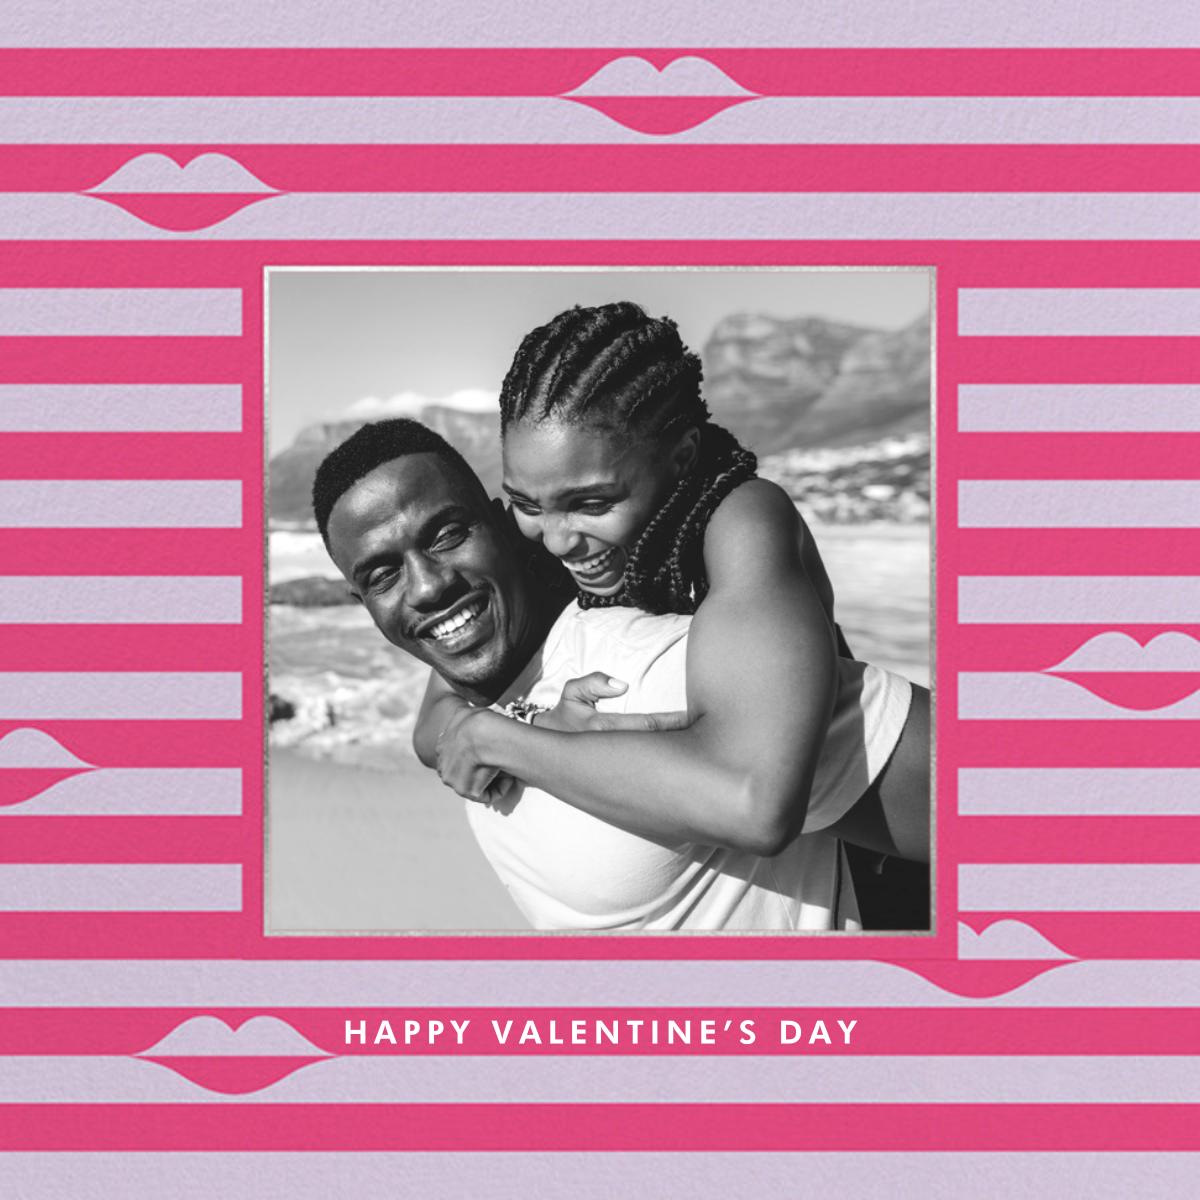 Sealed Lips Photo - Pink - kate spade new york - Valentine's Day